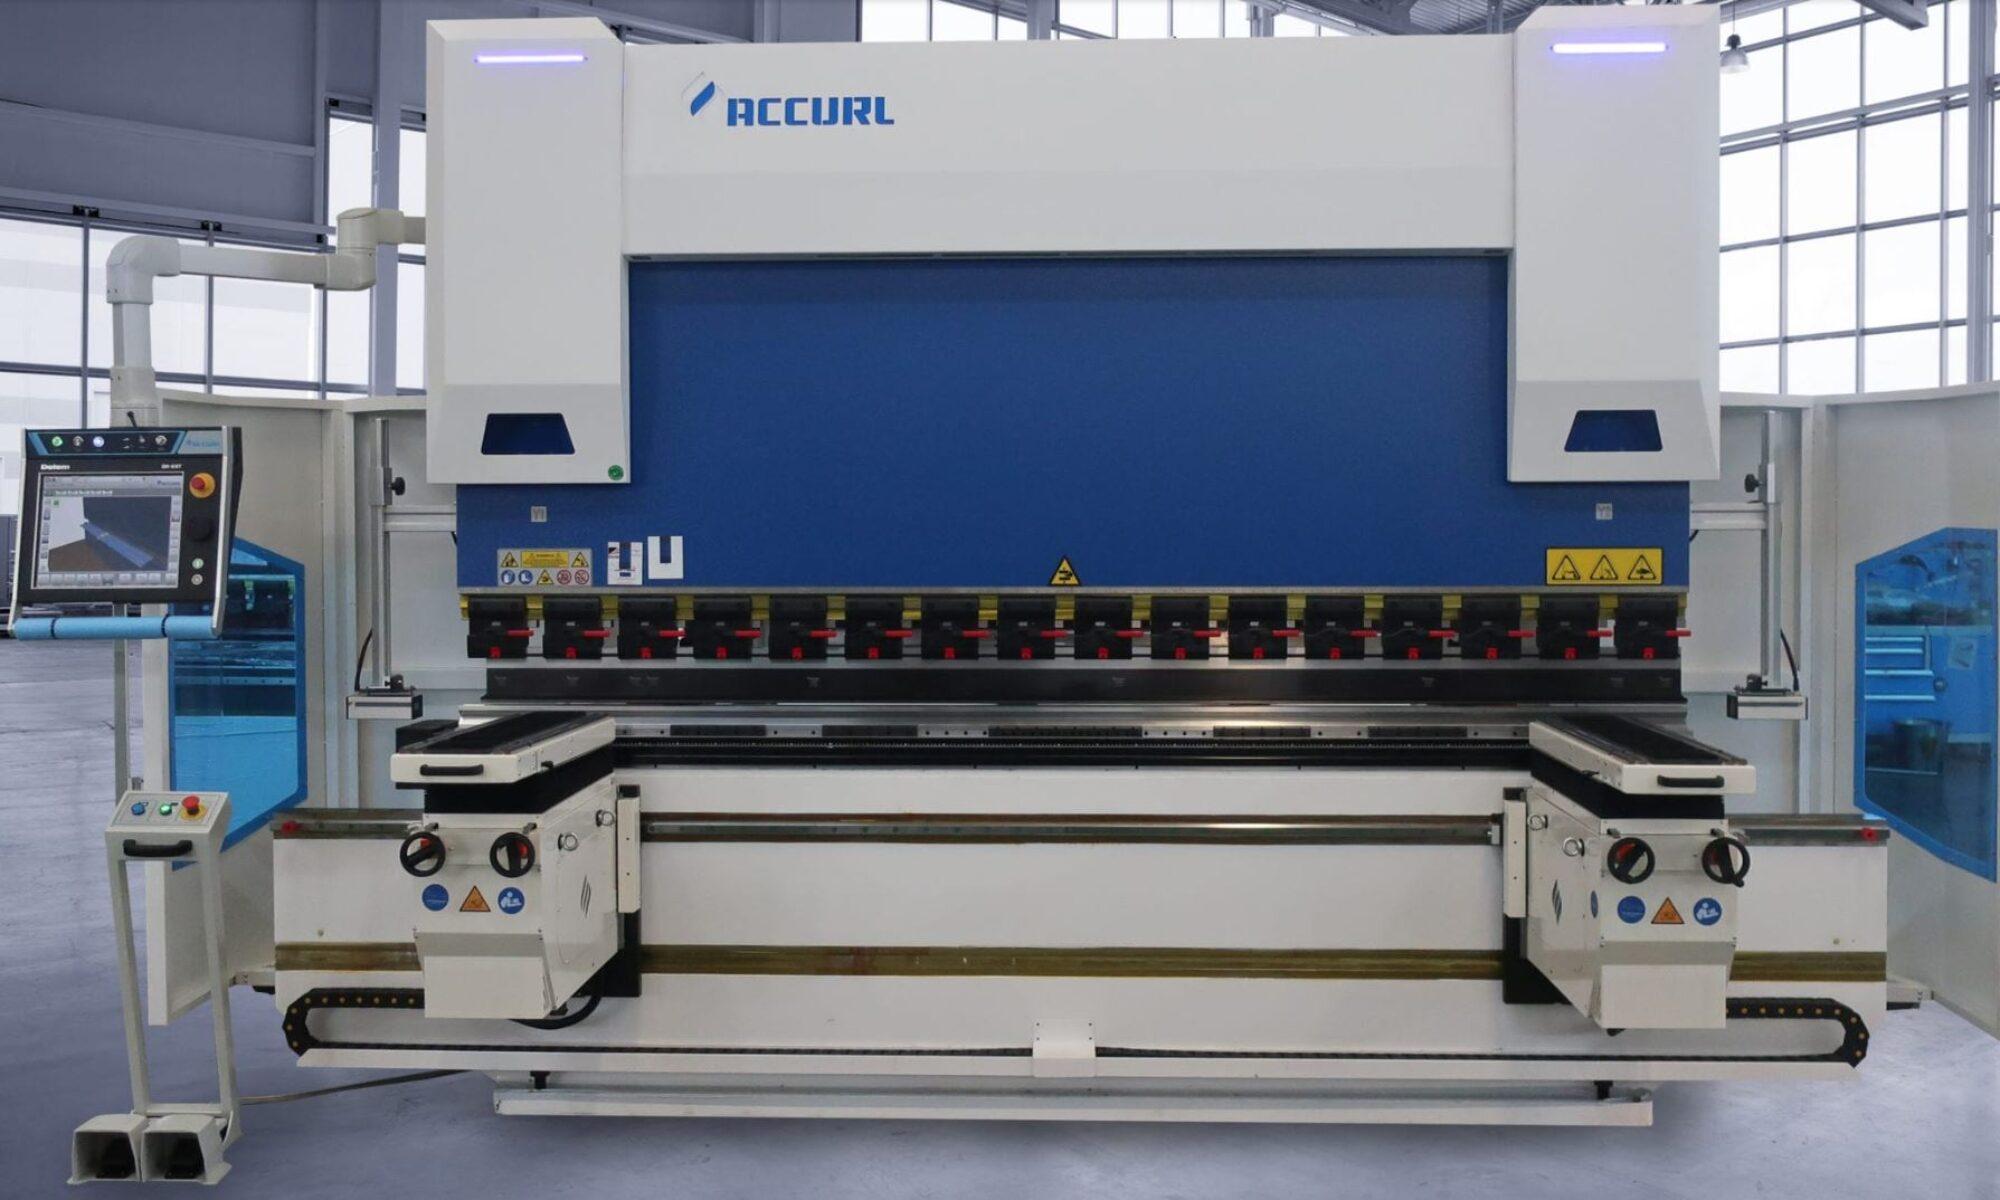 Neptune Machinery Limited